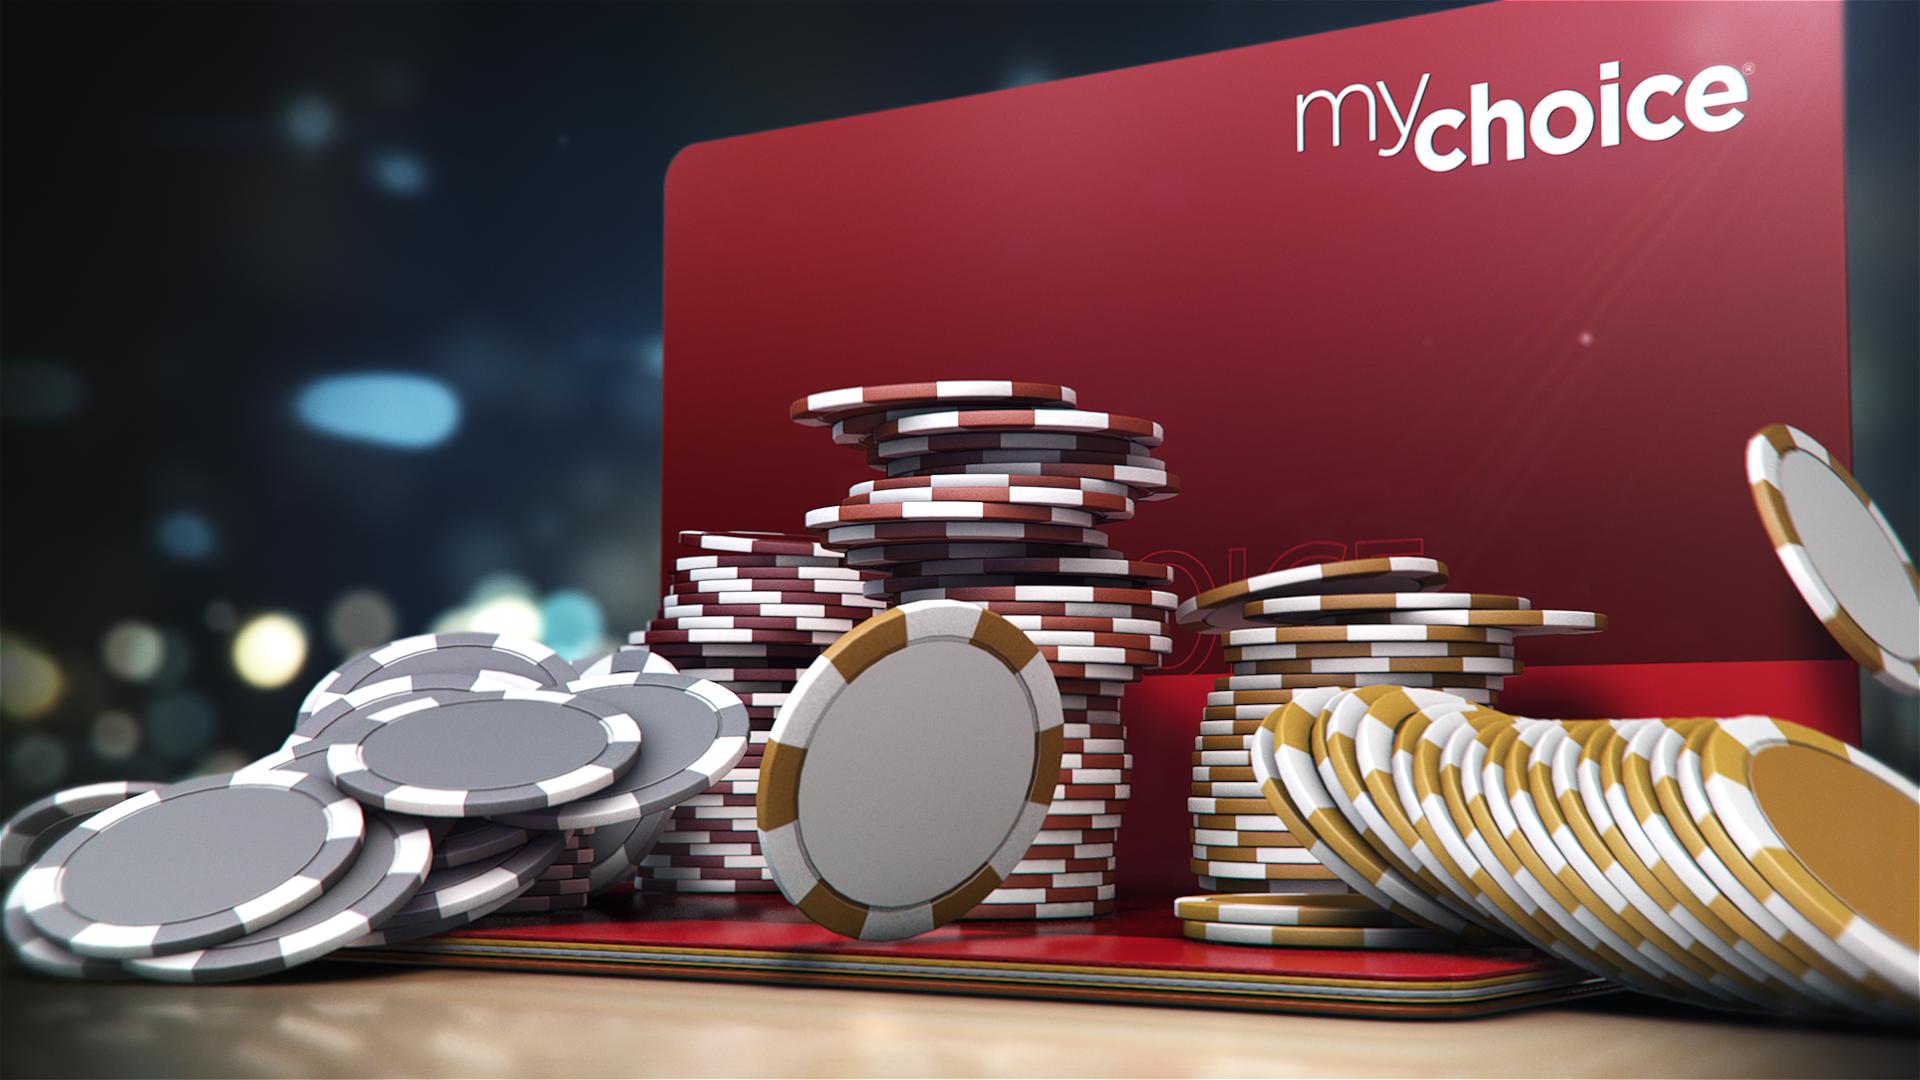 My choice casino rewards